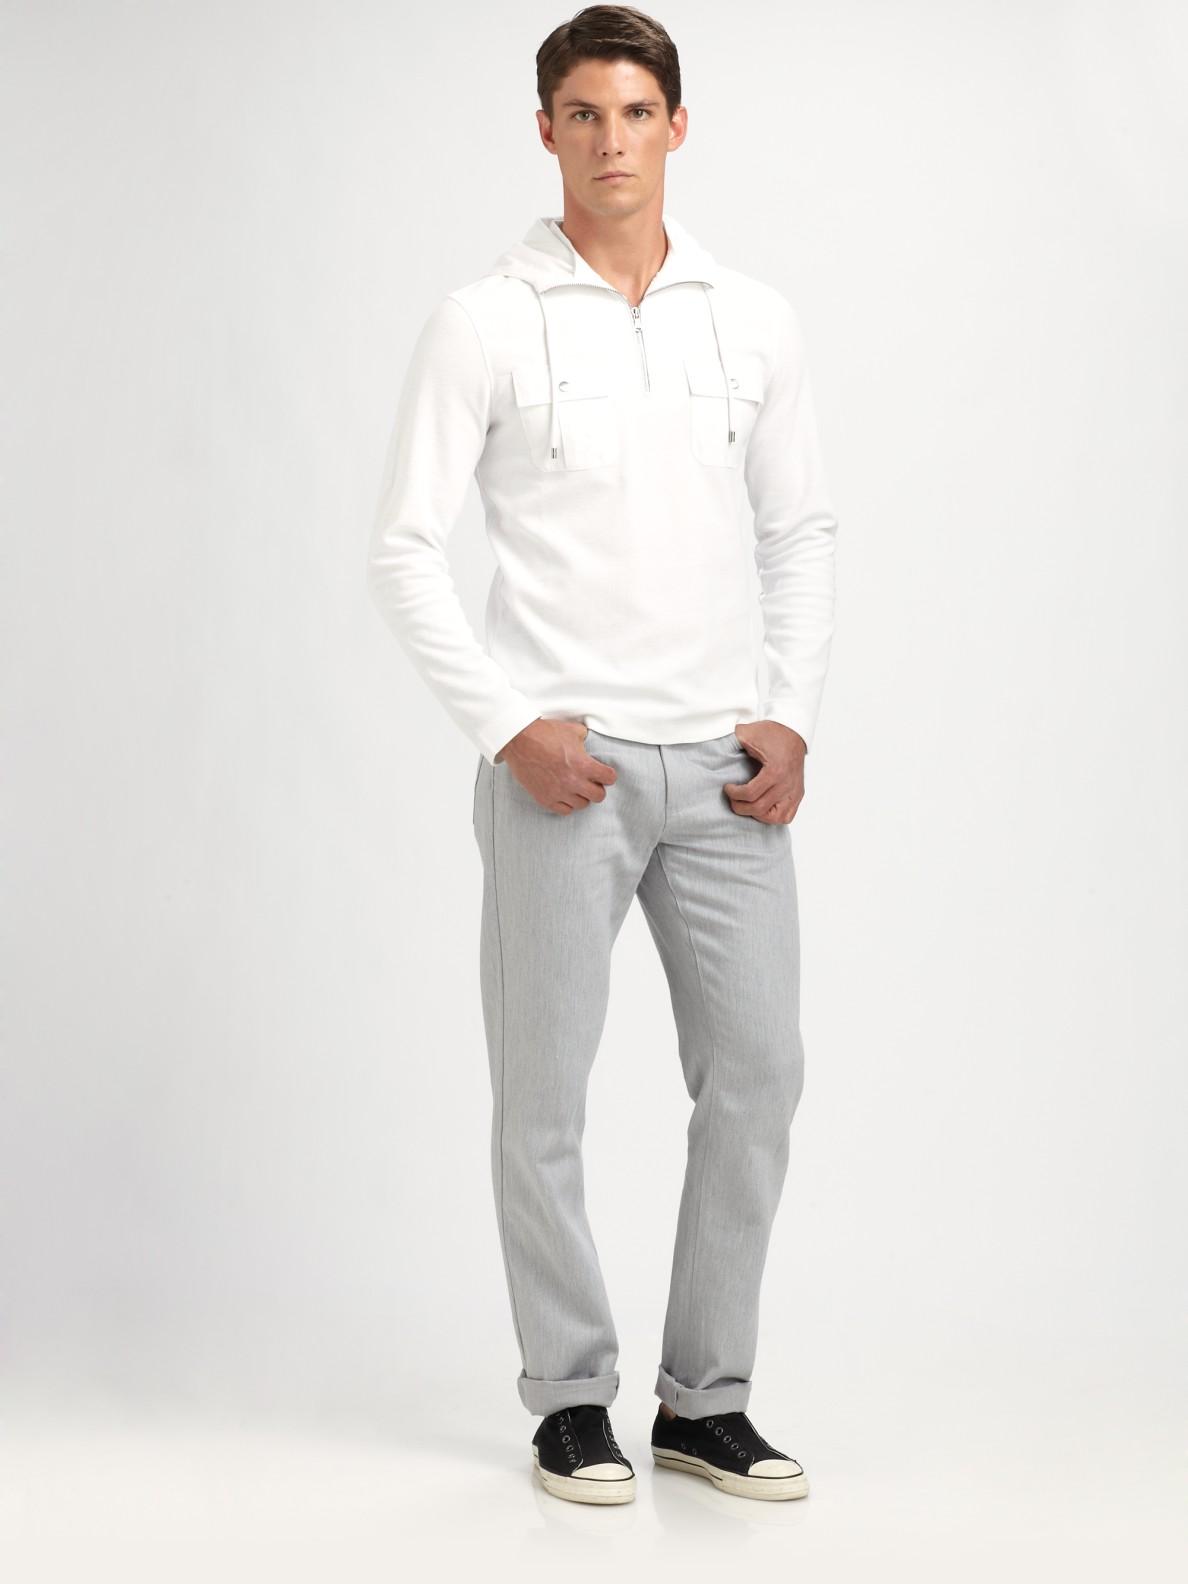 9f19034f9d002 Lyst - Michael Kors Waffleknit Hoodie in White for Men